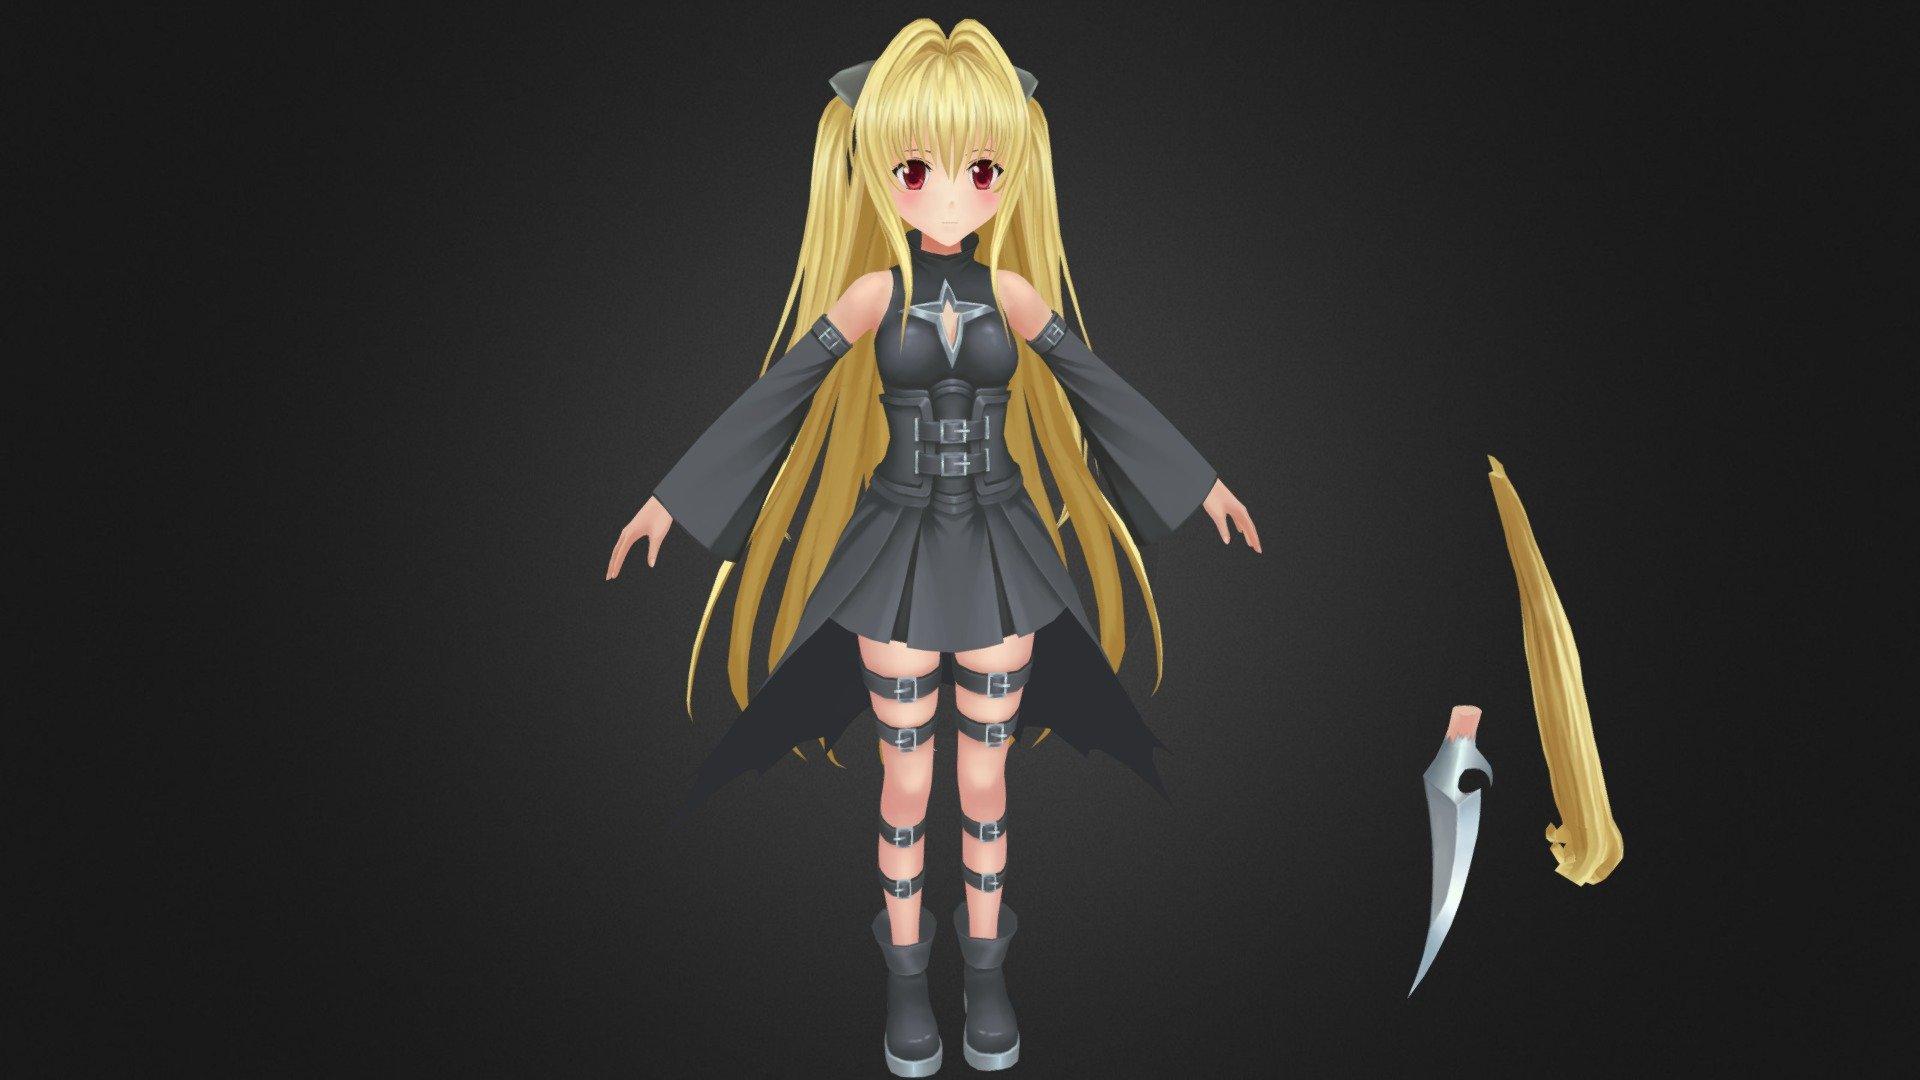 Konjiki No Yami Golden Darkness金色の闇 こんじきのやみ 3d Model